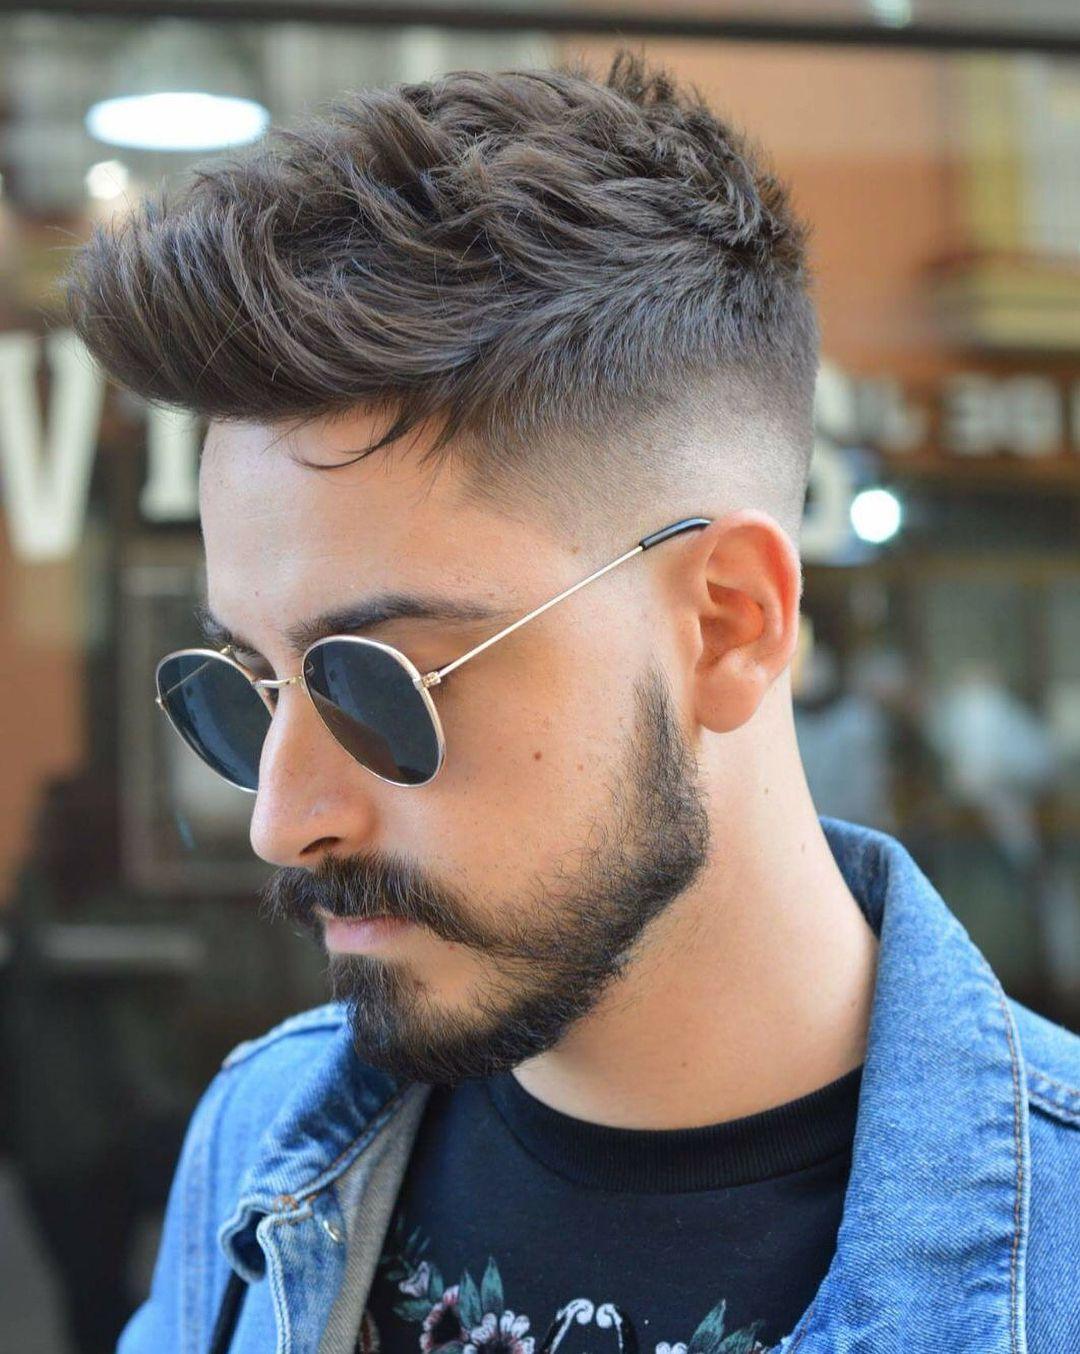 top 100 coiffures en d grad top 100 coiffures en d grad pinterest hair styles hair cuts. Black Bedroom Furniture Sets. Home Design Ideas